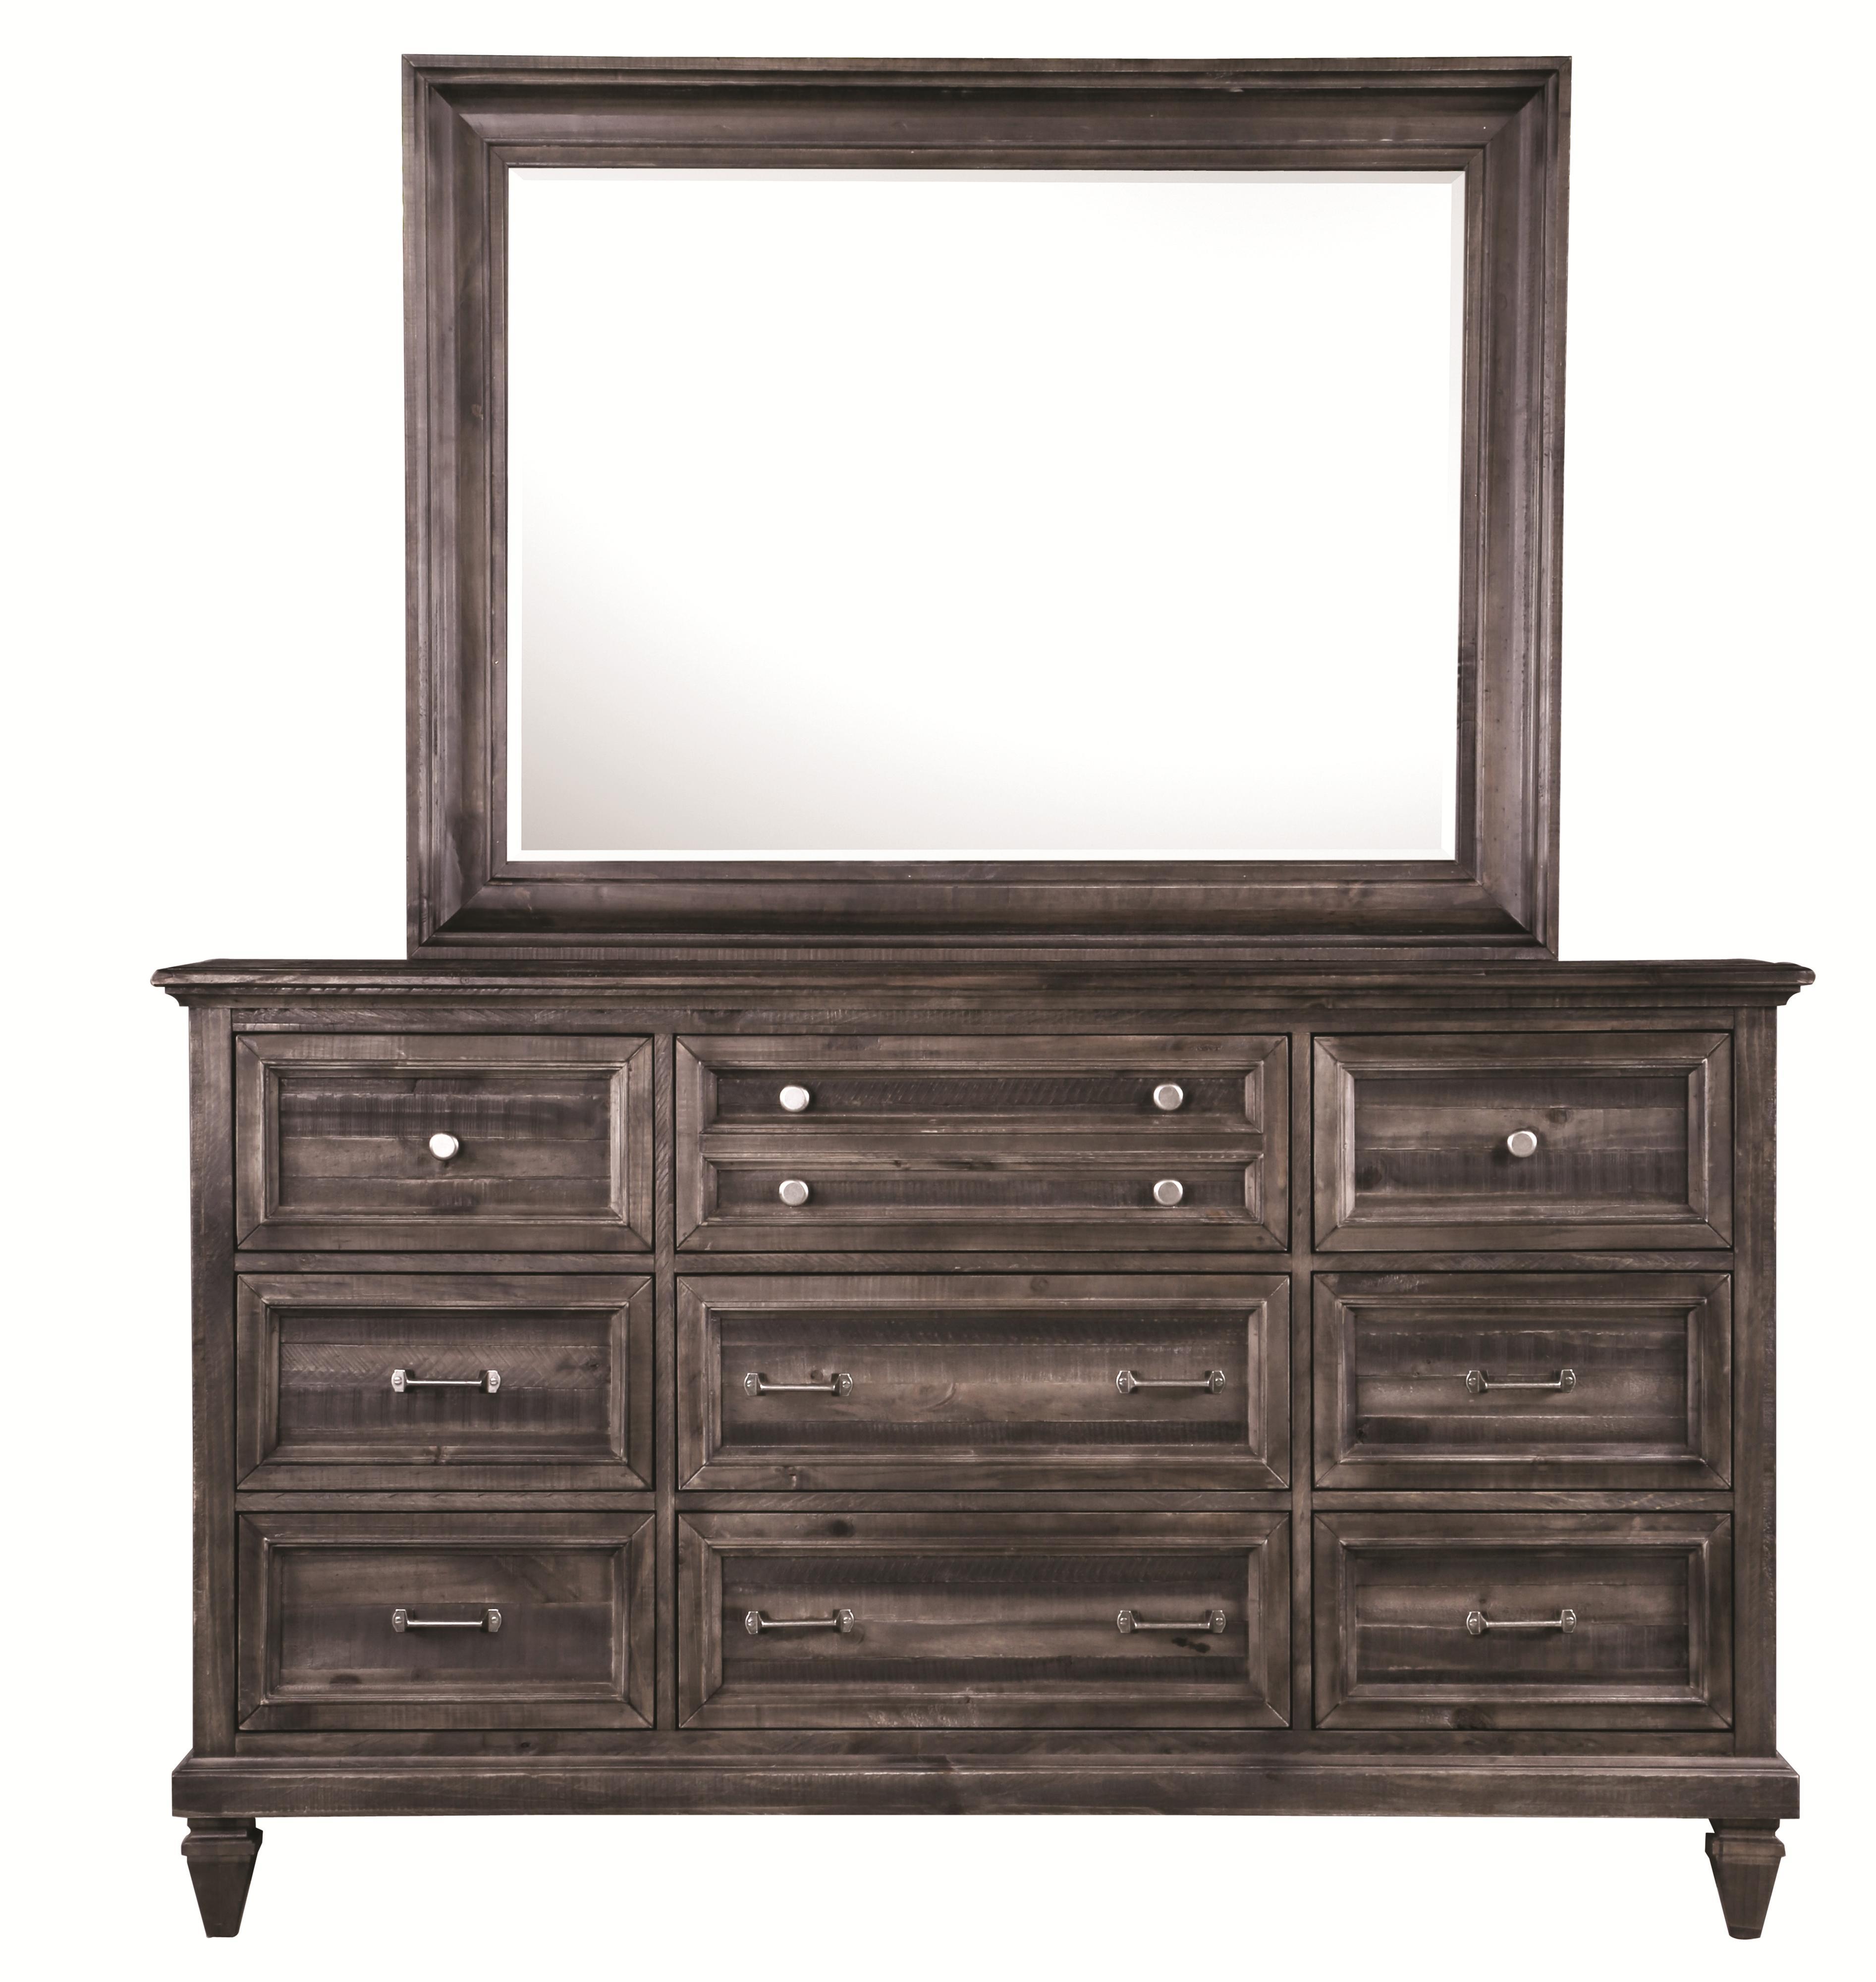 Benton Dresser and Mirror Combo at Walker's Furniture